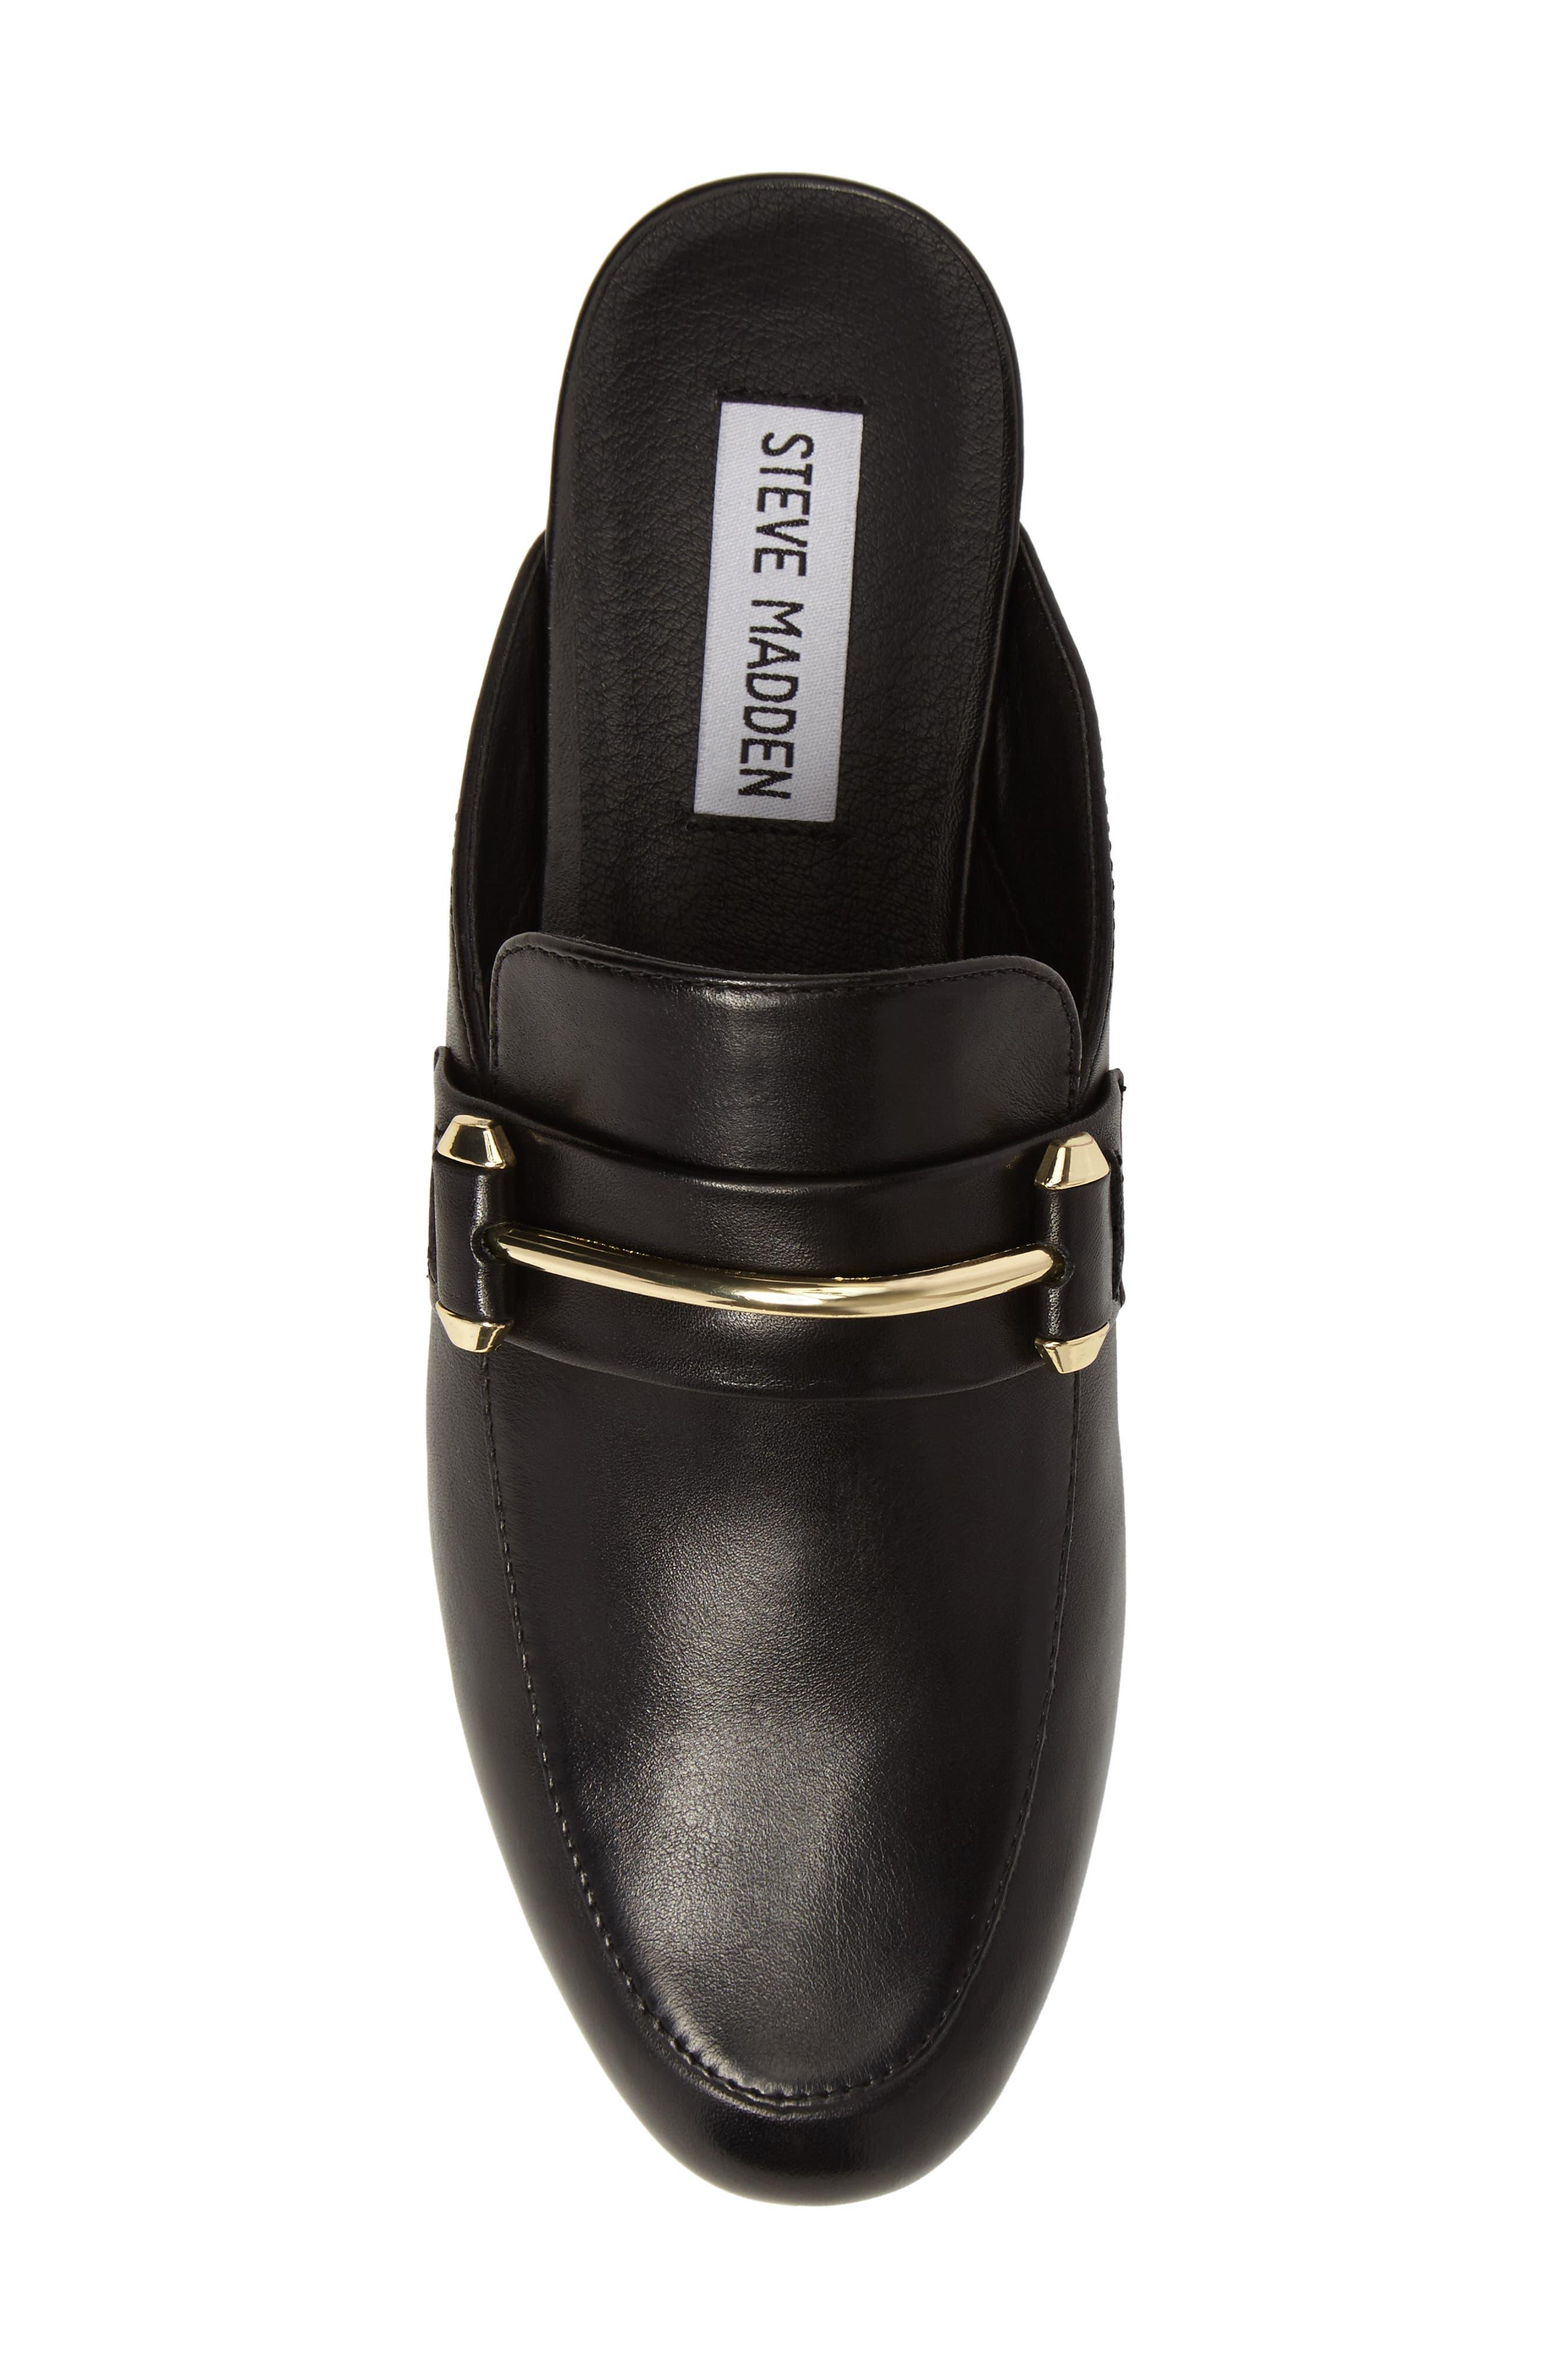 Kera Flat Loafer Mule,                             Alternate thumbnail 5, color,                             Black Leather